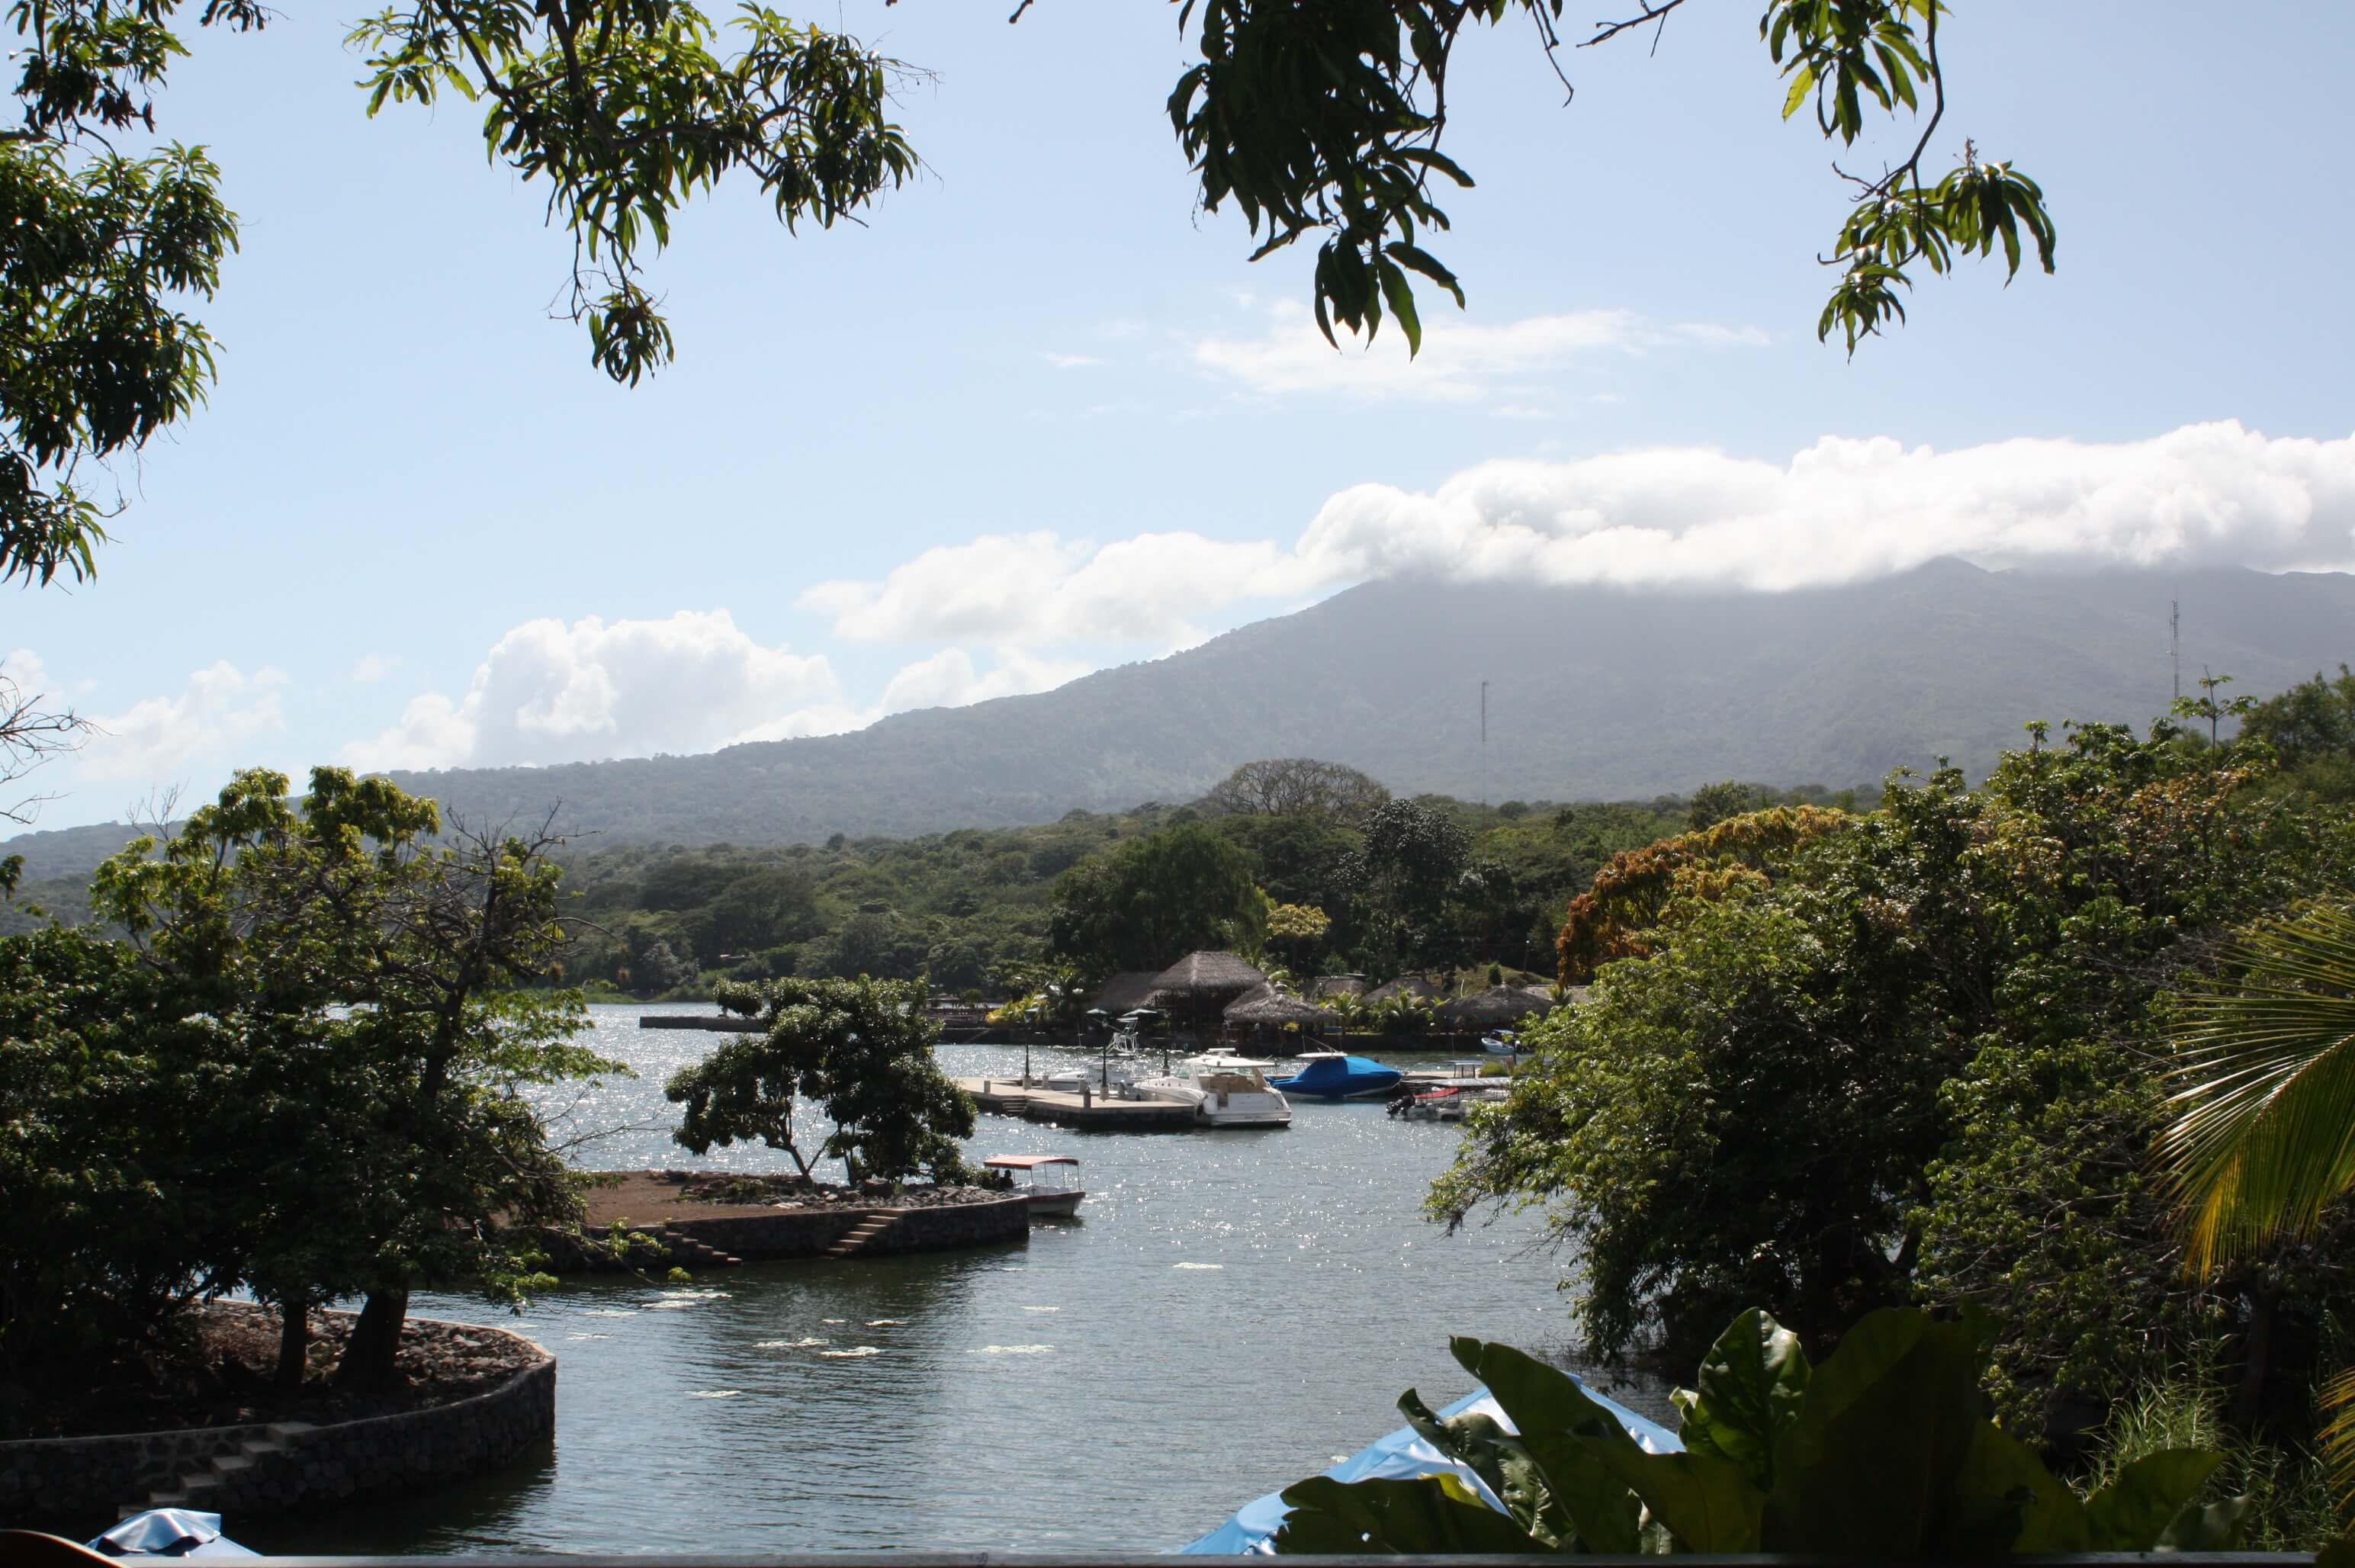 tours isletas de granada; mombacho volcano granada islets; granada islets